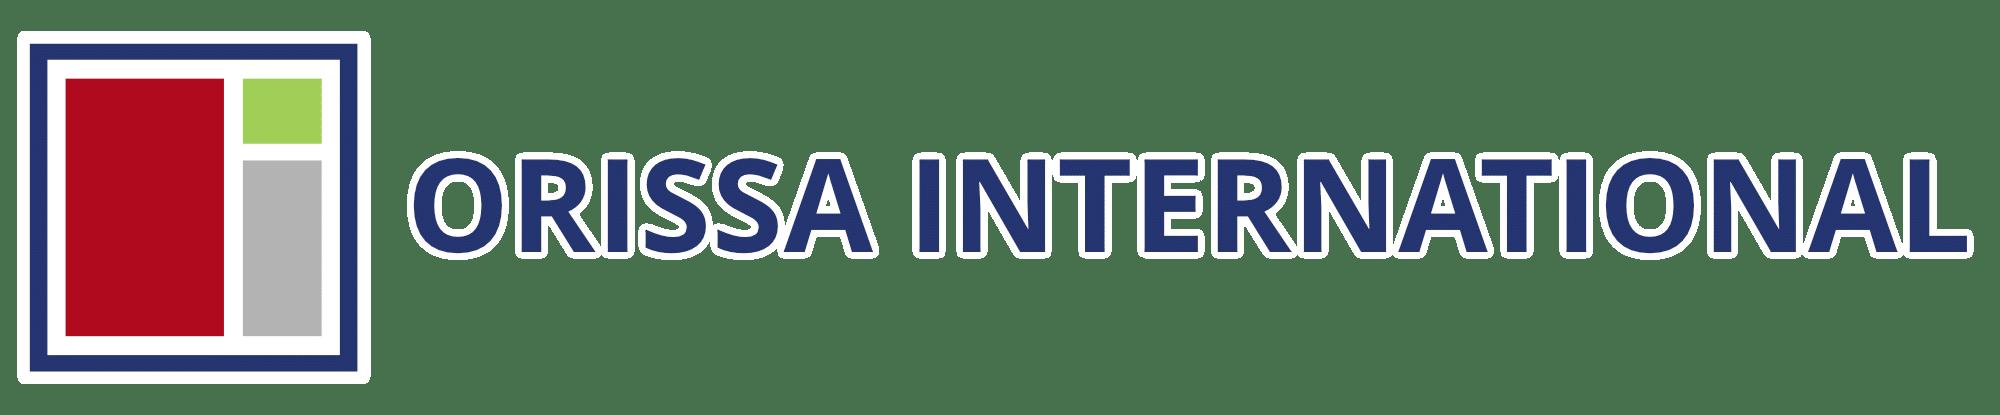 Orissa International